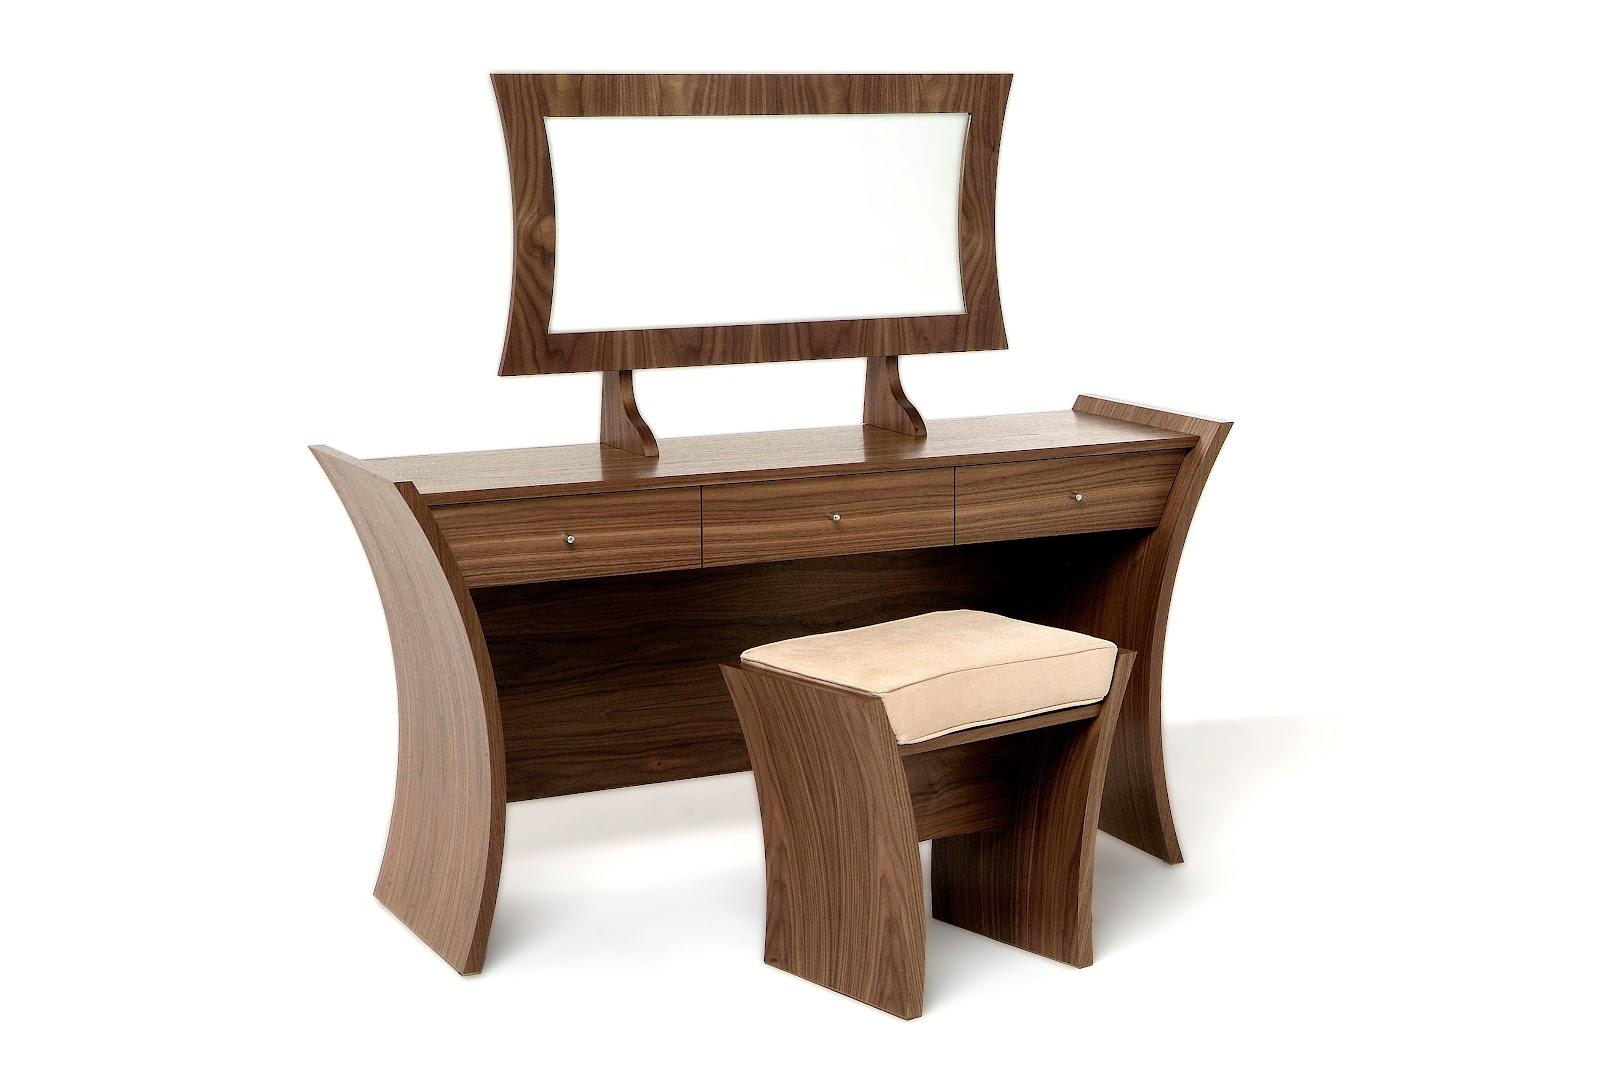 Dressing Table Designs Interior Design And Deco